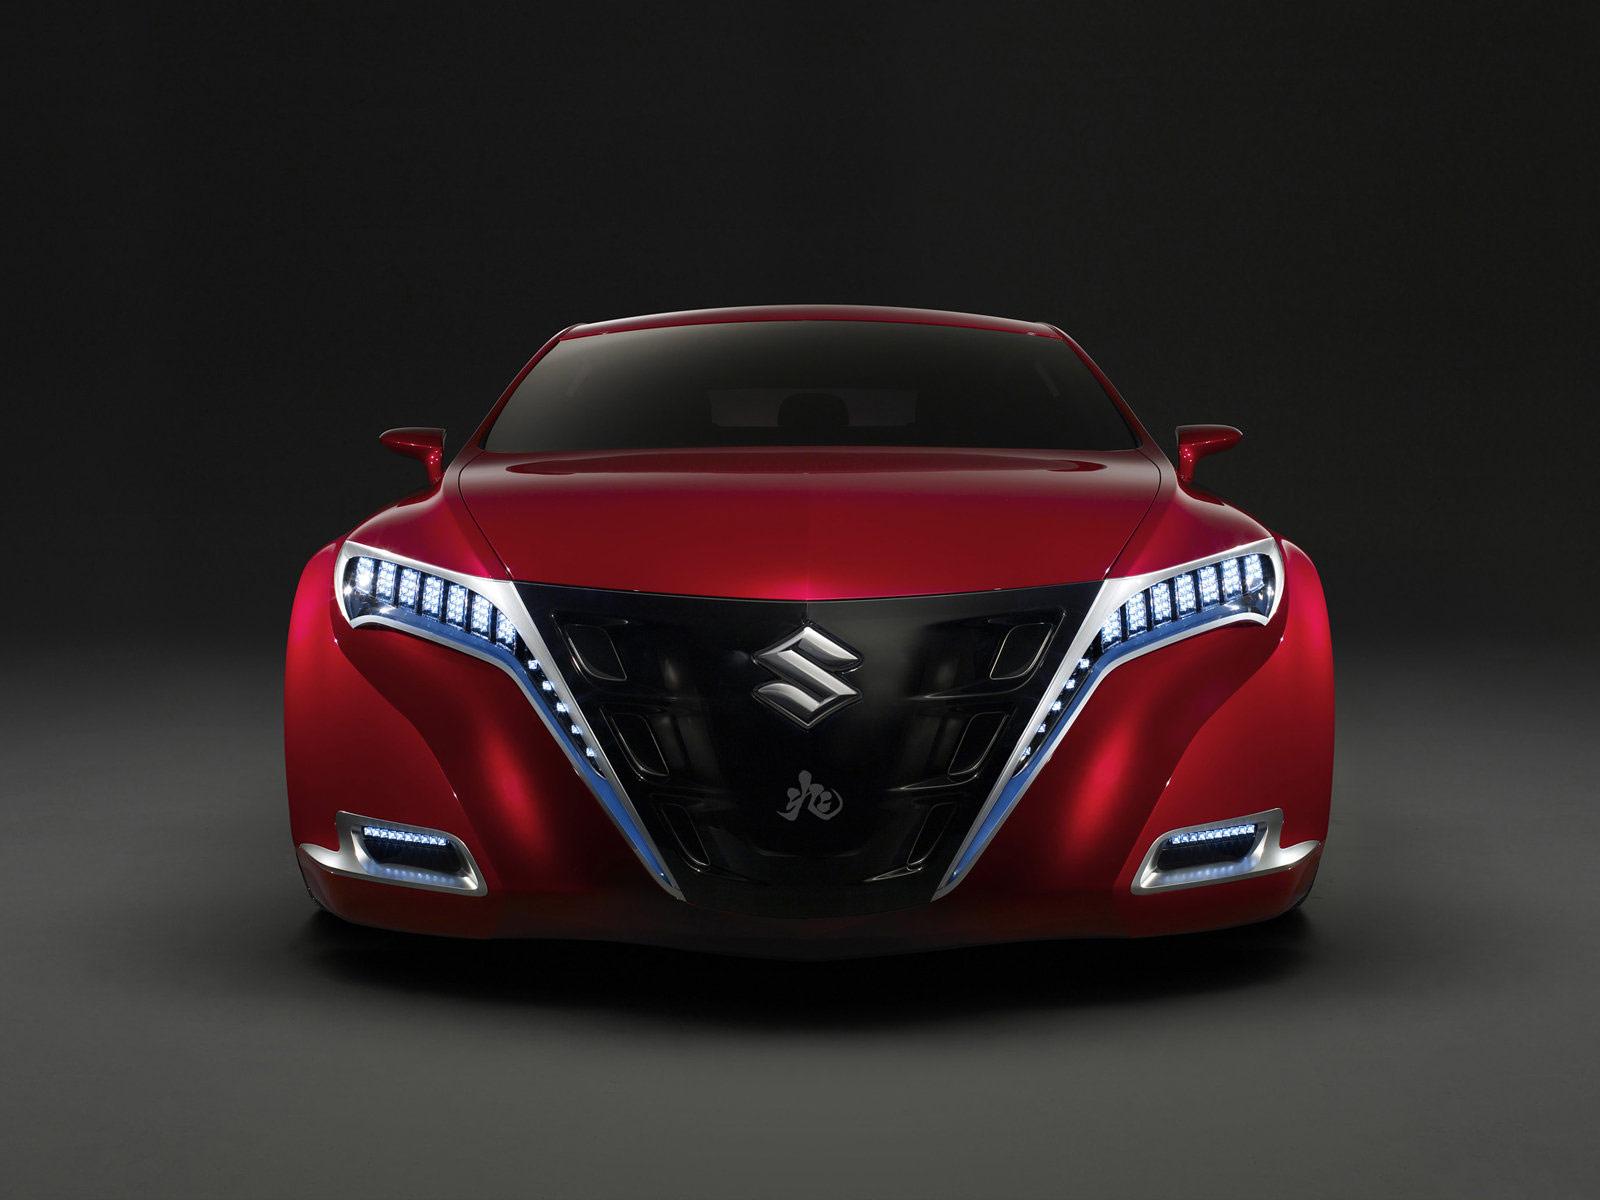 suzuki kizashi concept 5 Wallpapers Of Cars Hd